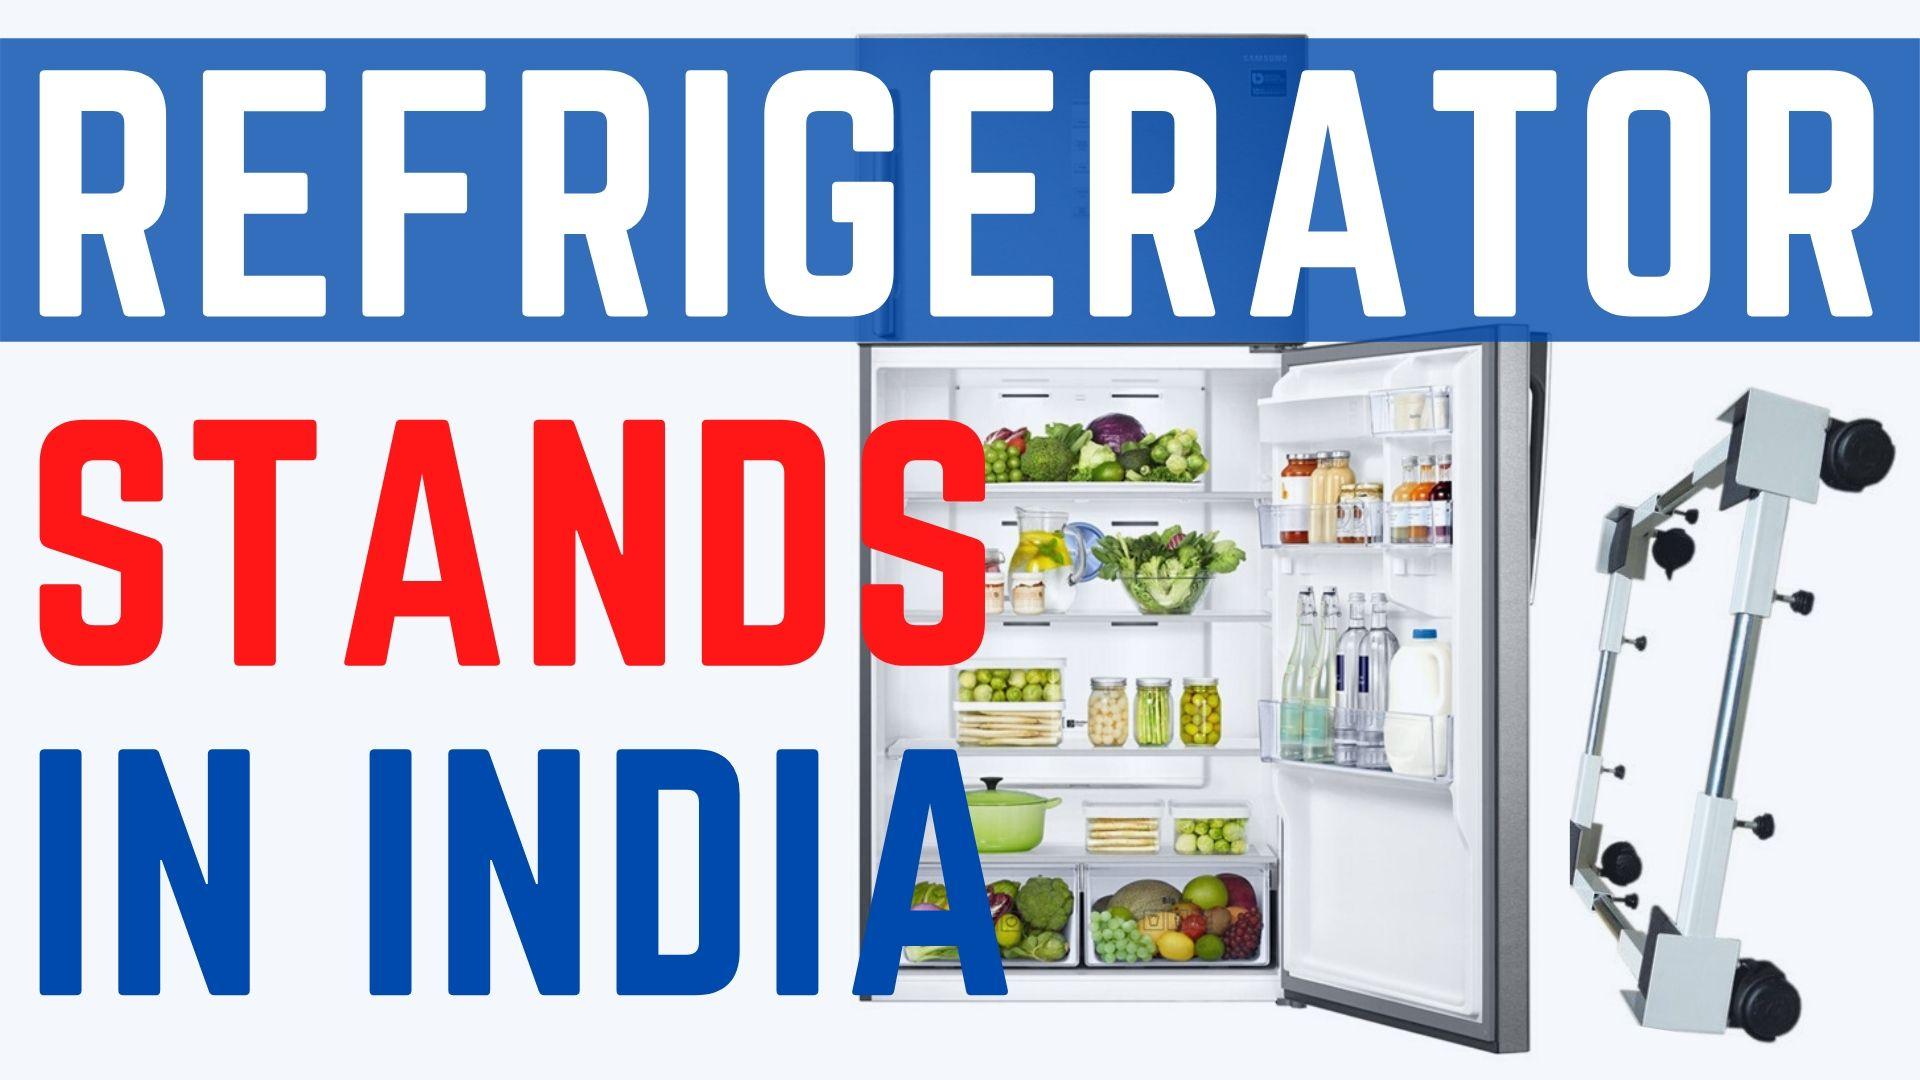 refrigerator: refrigerator stands